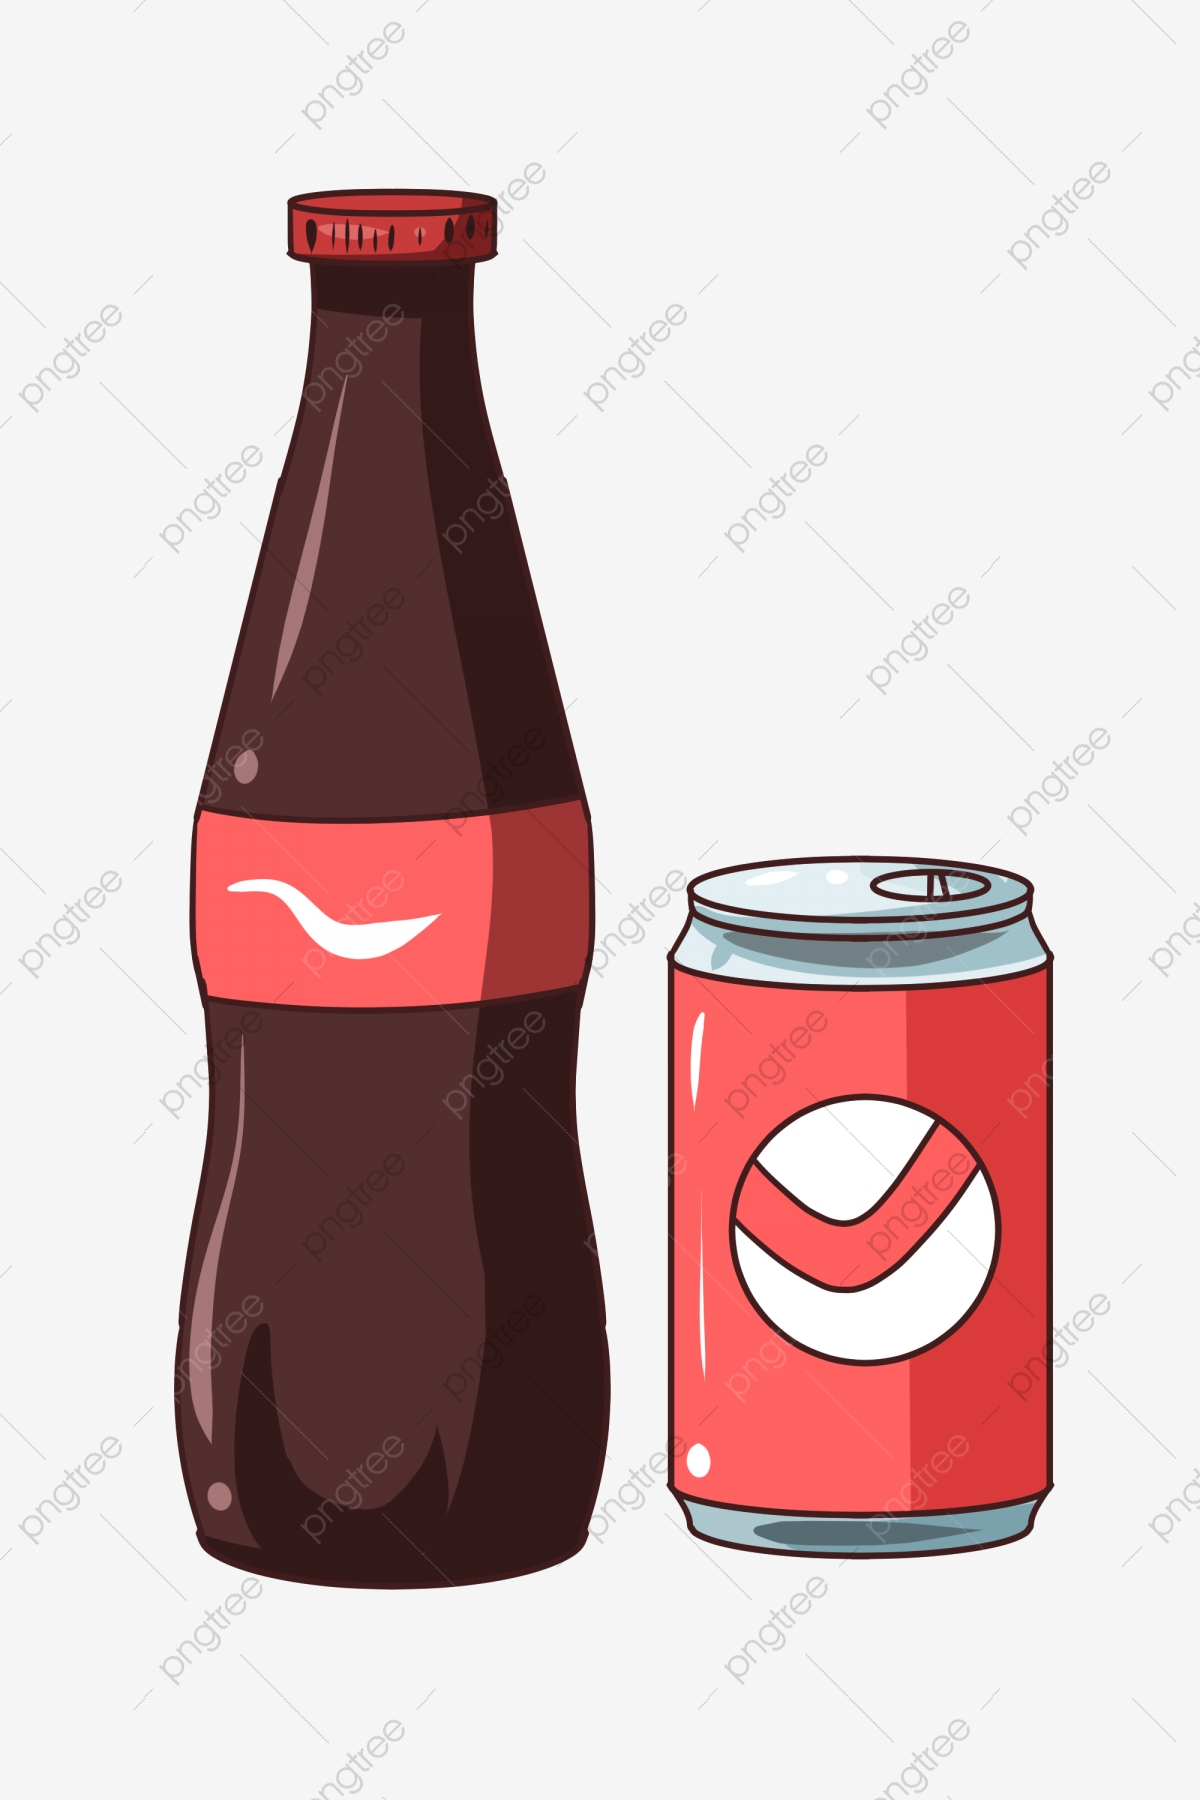 Summer Cola Bottle Illustration Soda Clipart Summer Cola Png Transparent Clipart Image And Psd File For Free Download